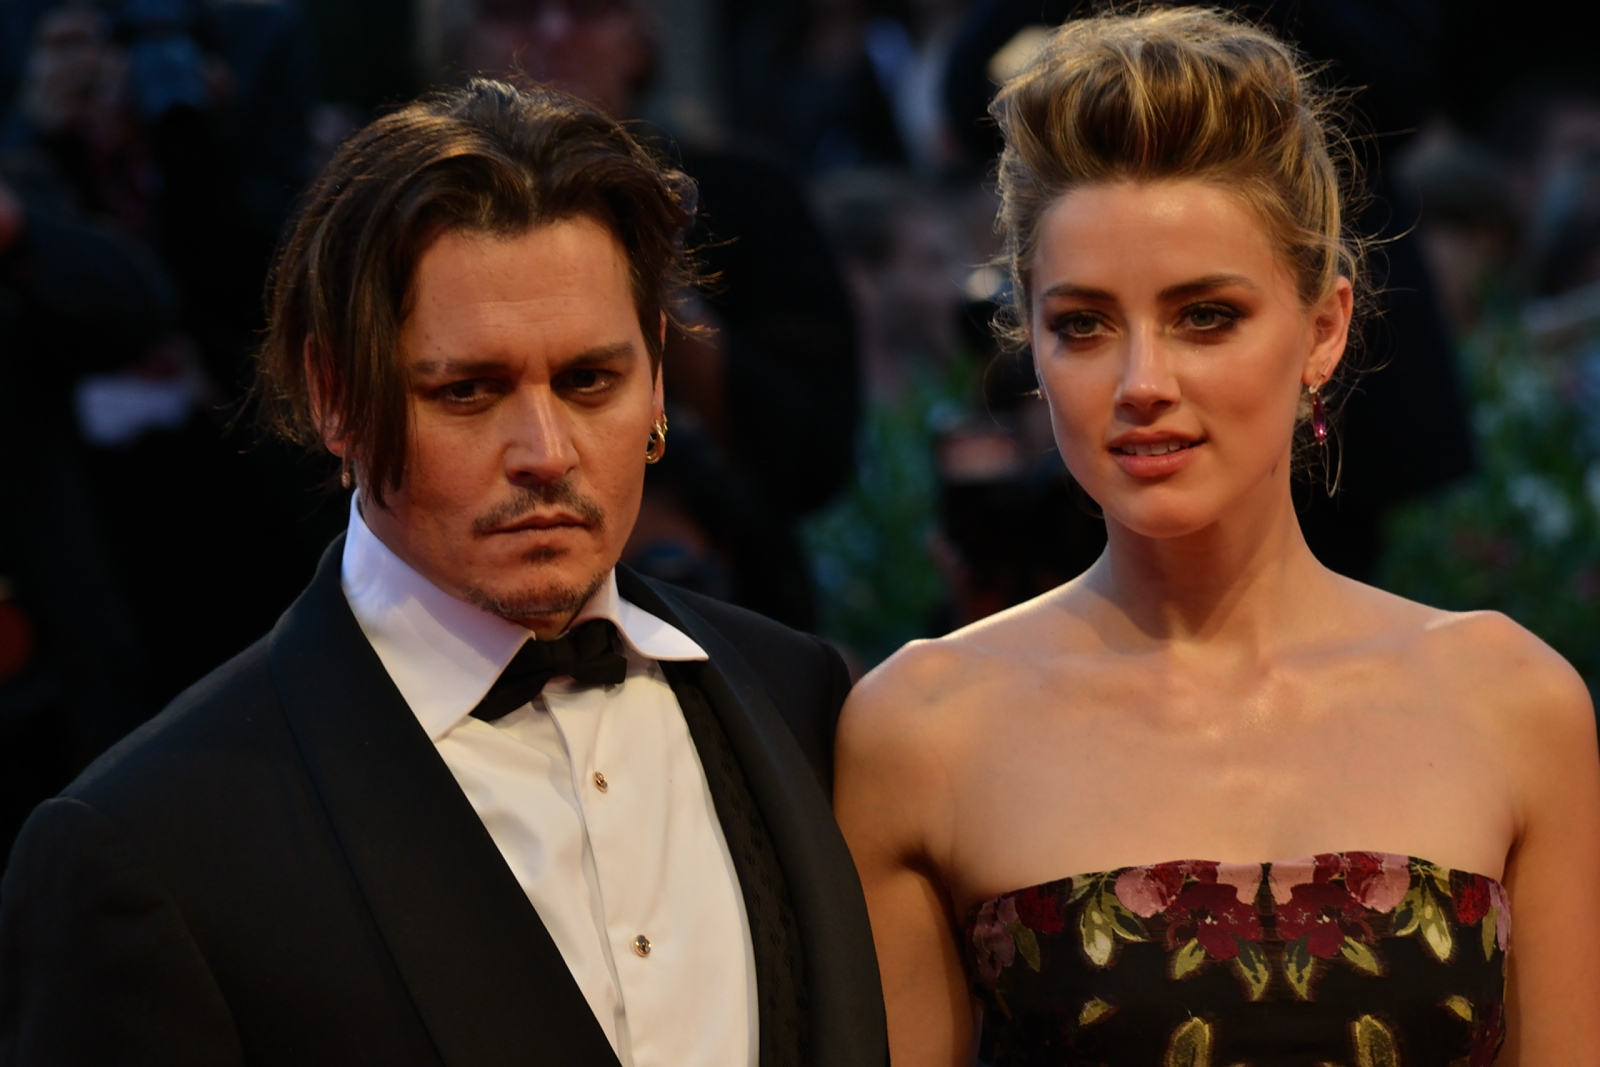 Venezia 2015: Amber Heard e Johnny Depp sul red carpet di The Danish Girl